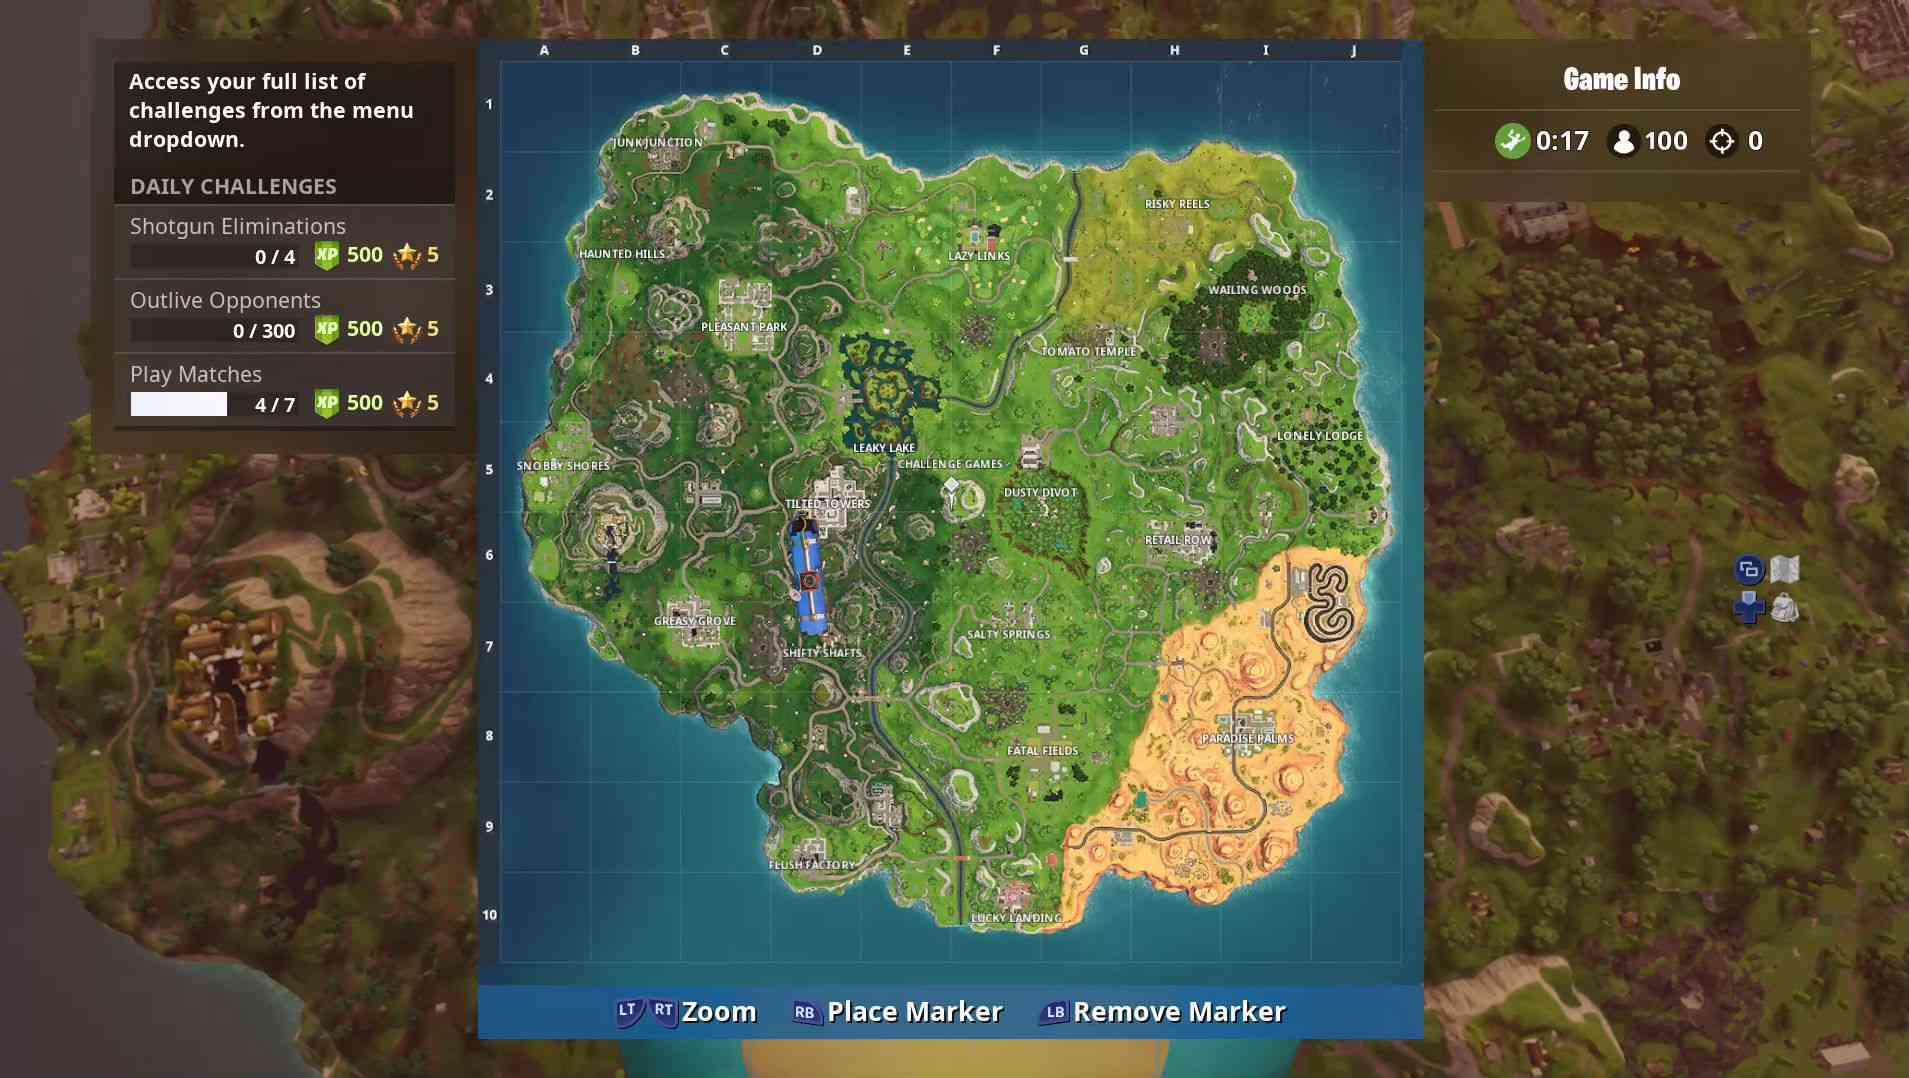 A screenshot of the Fortnite map.